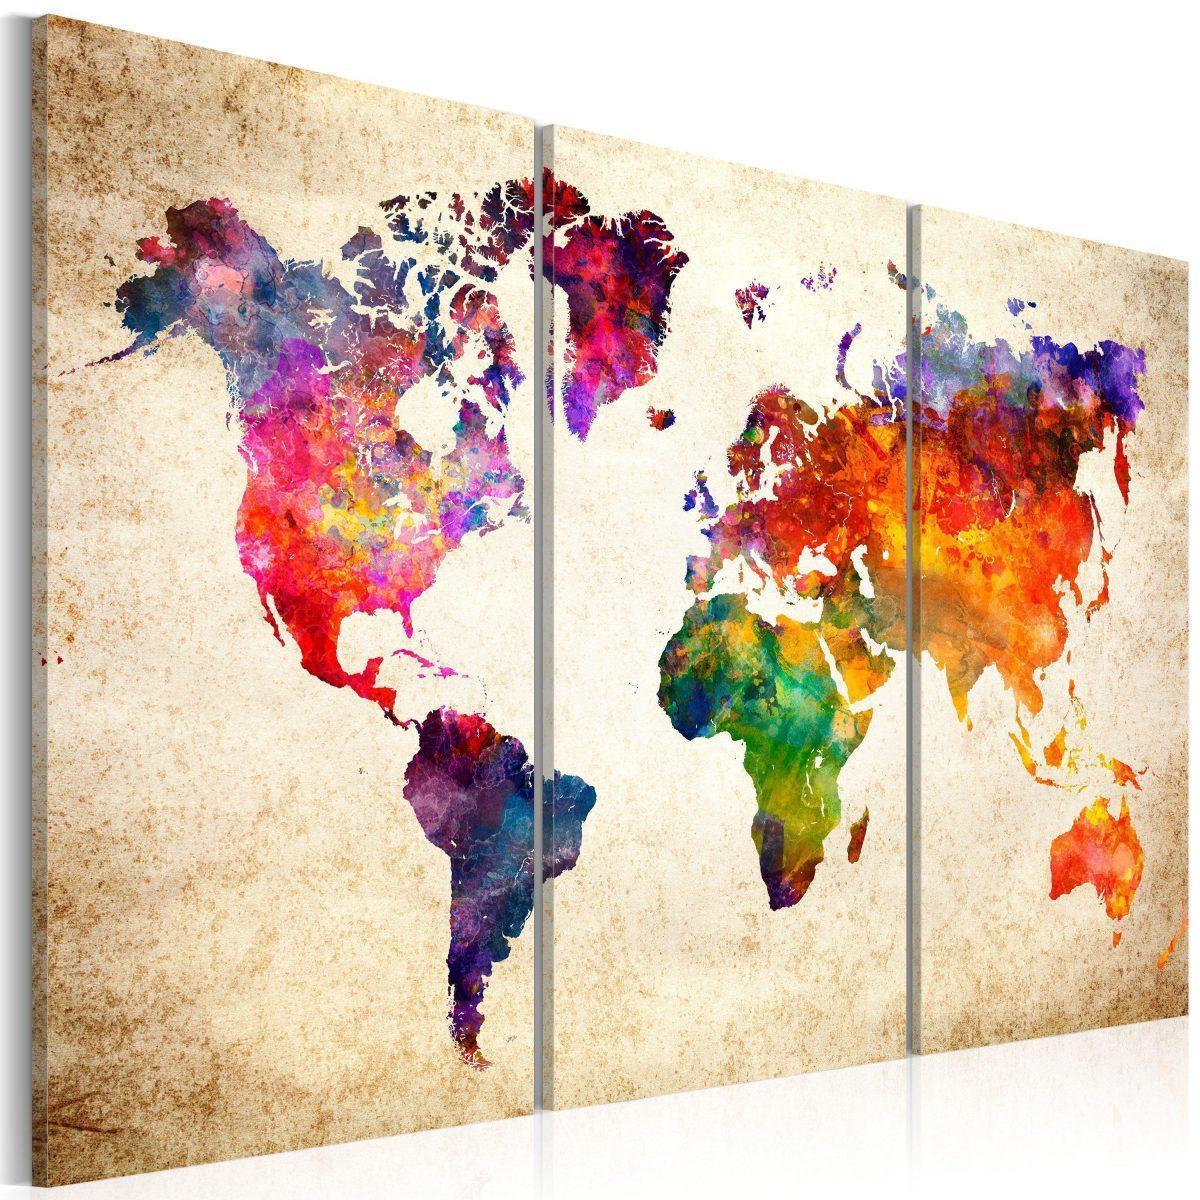 Canvas Tavla - The World's Map in Watercolor - 90x60